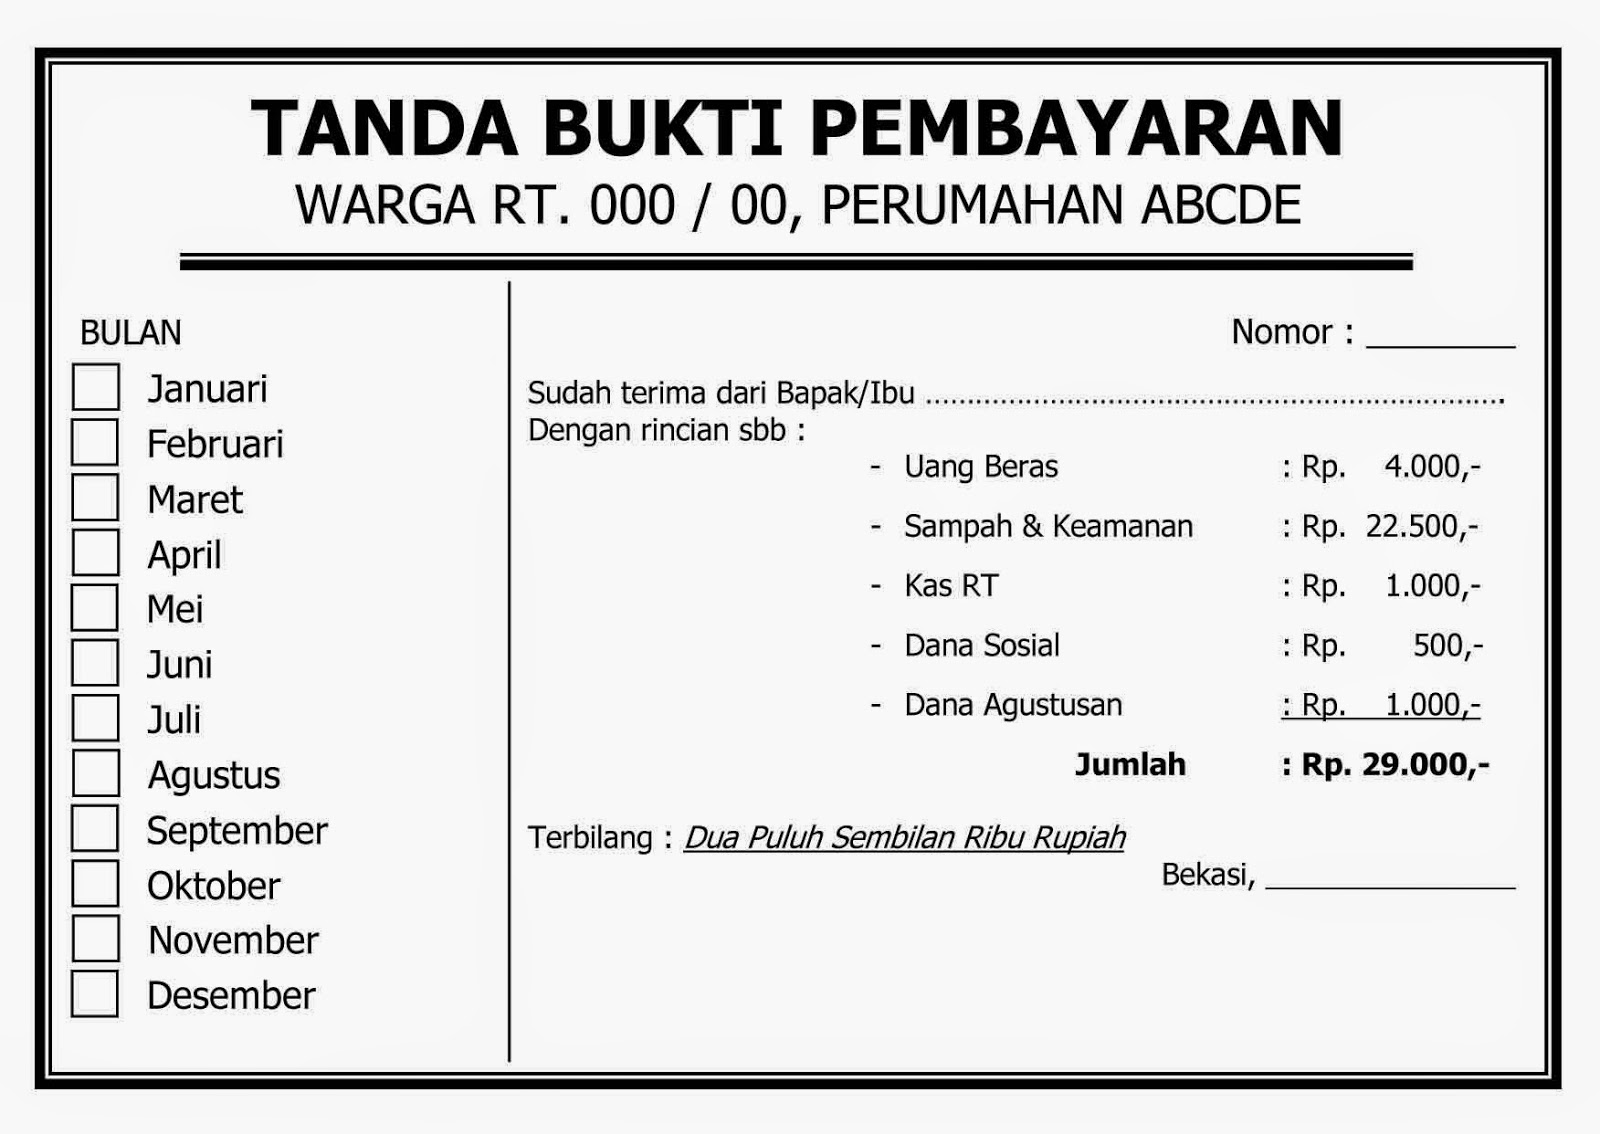 Contoh Form Tanda Bukti Pembayaran Iuran Rt Wisanggeni